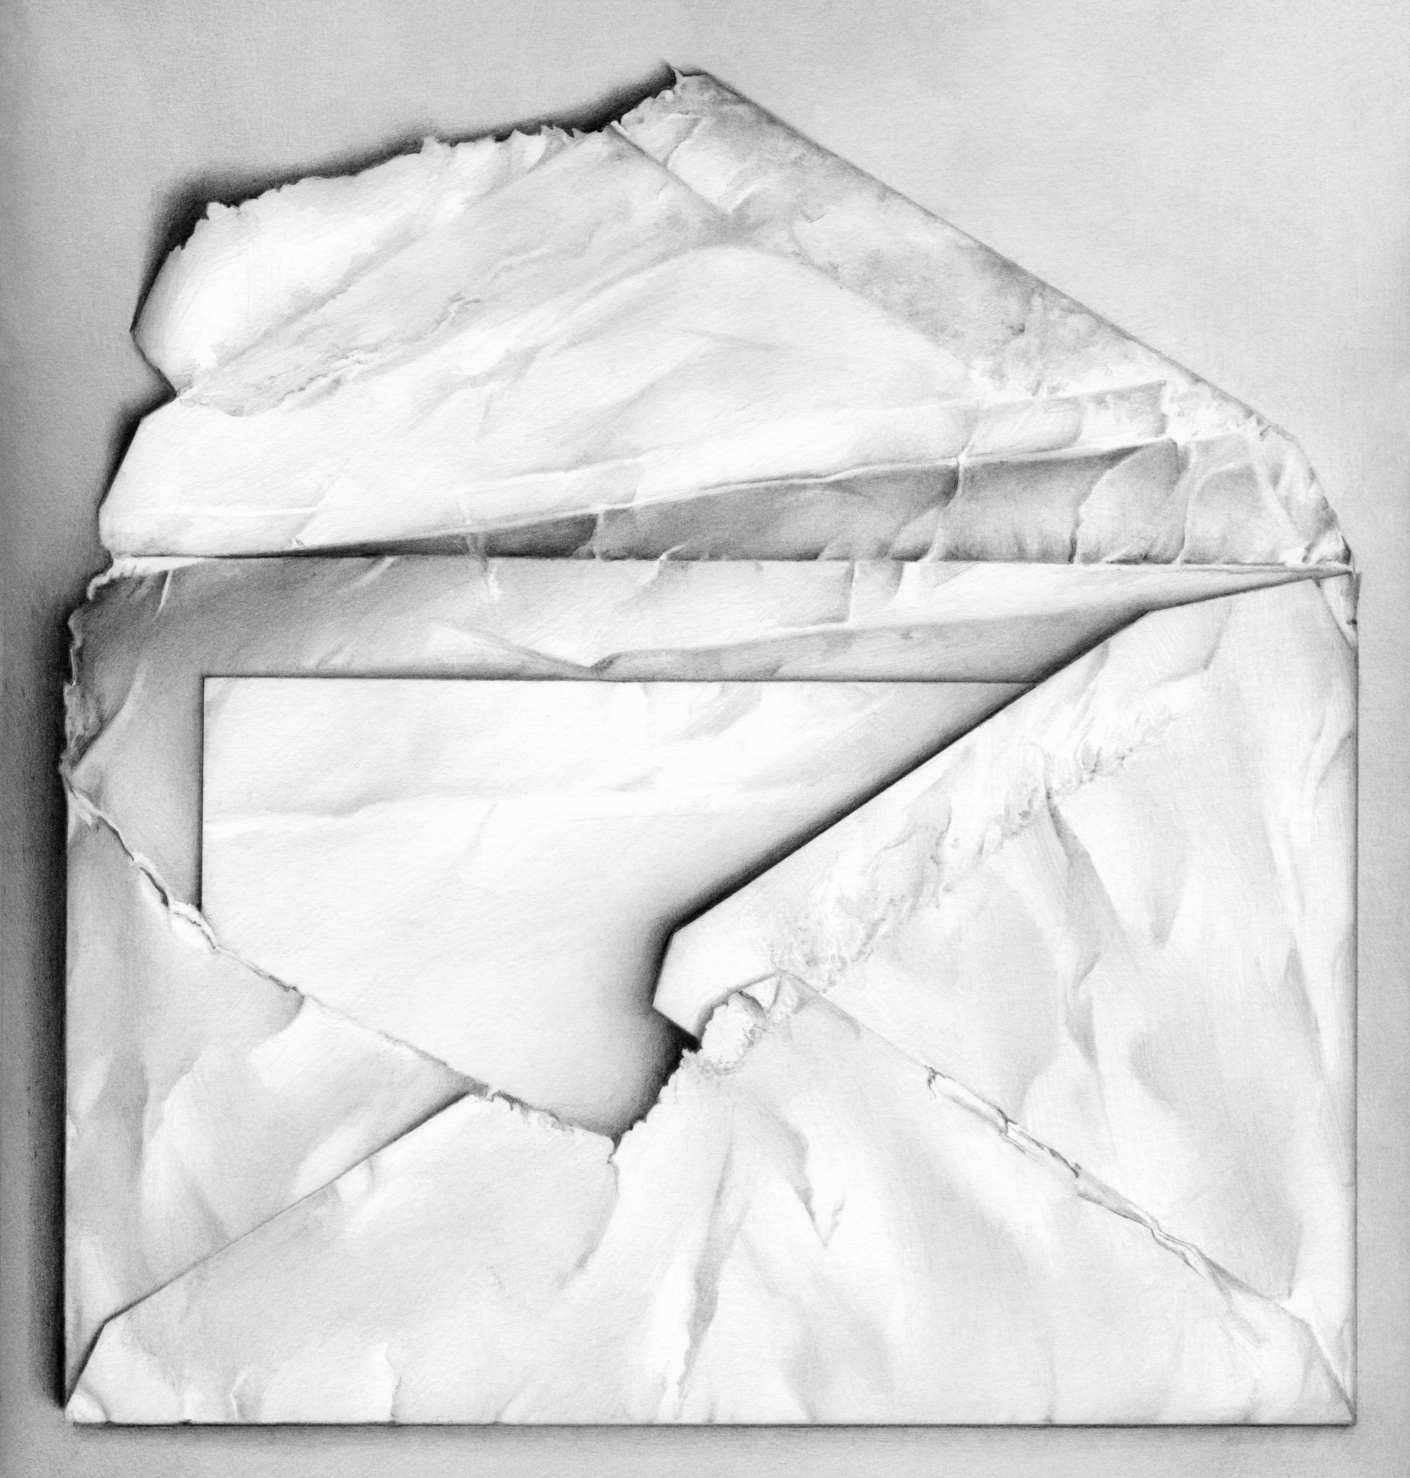 Paper scissors stone lot 14 cath riley envelope